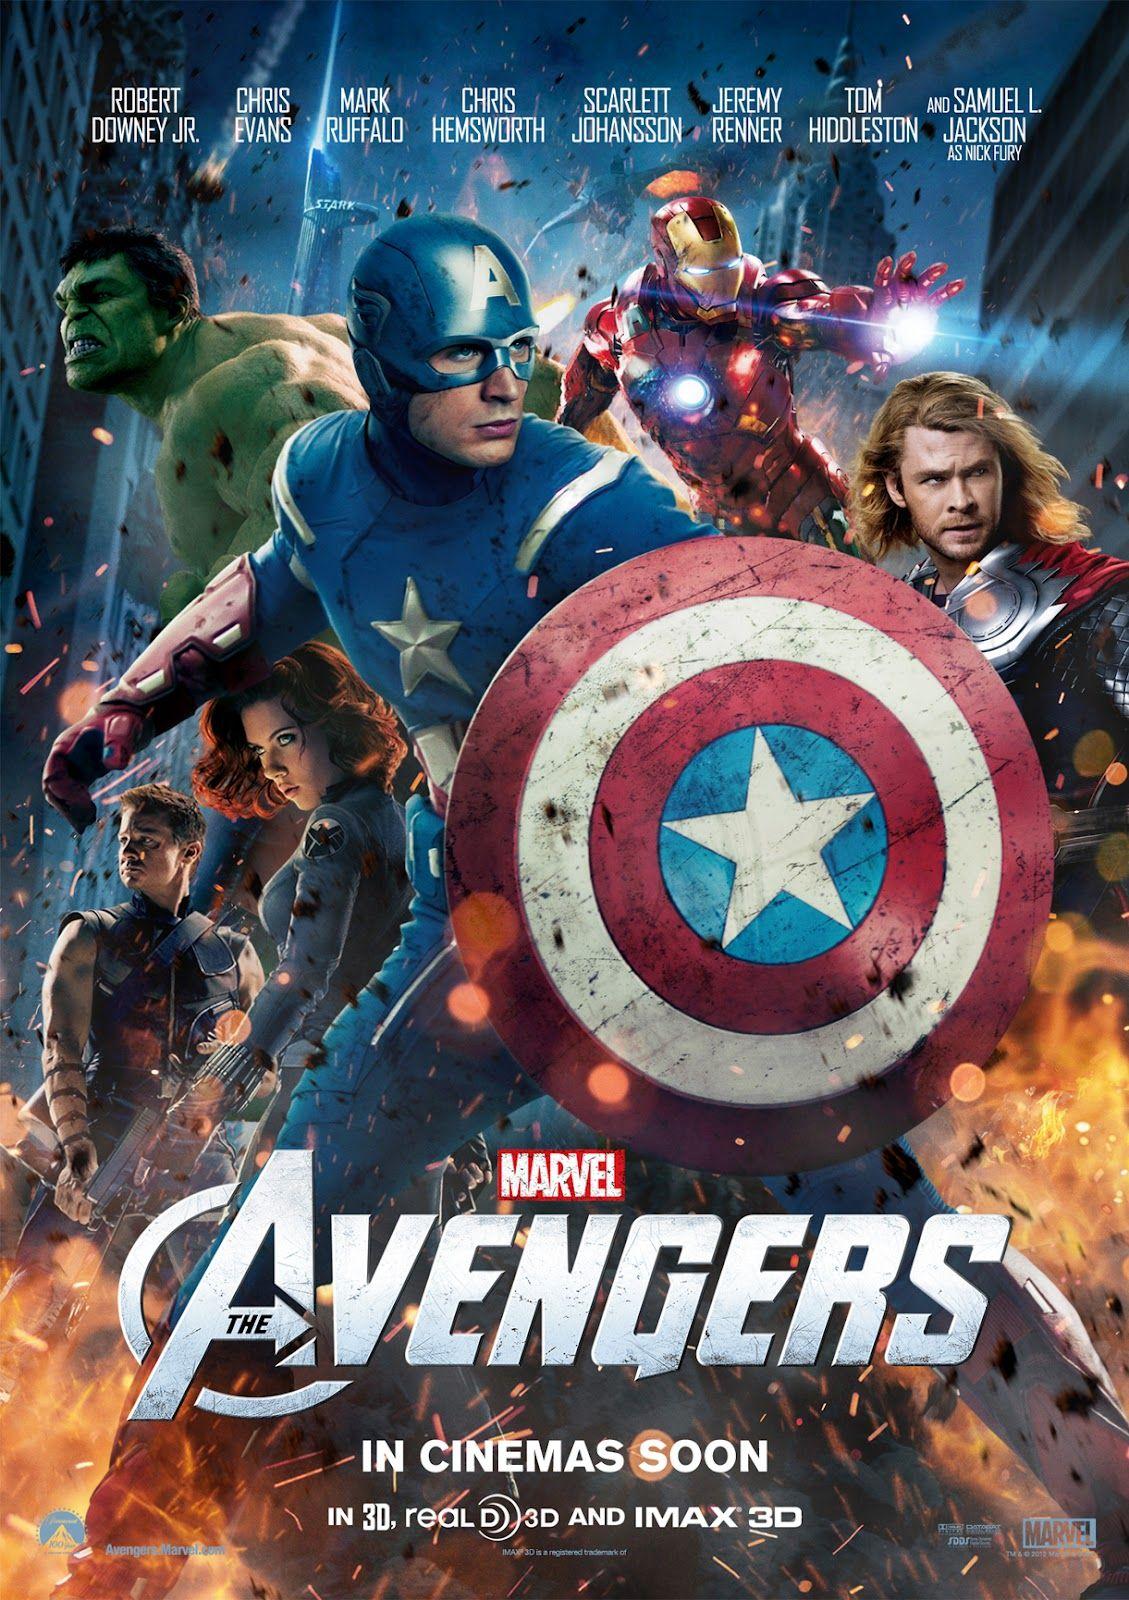 Los Vengadores 1 2012 Avengers Imagines Avengers Movies Avengers Movie Posters